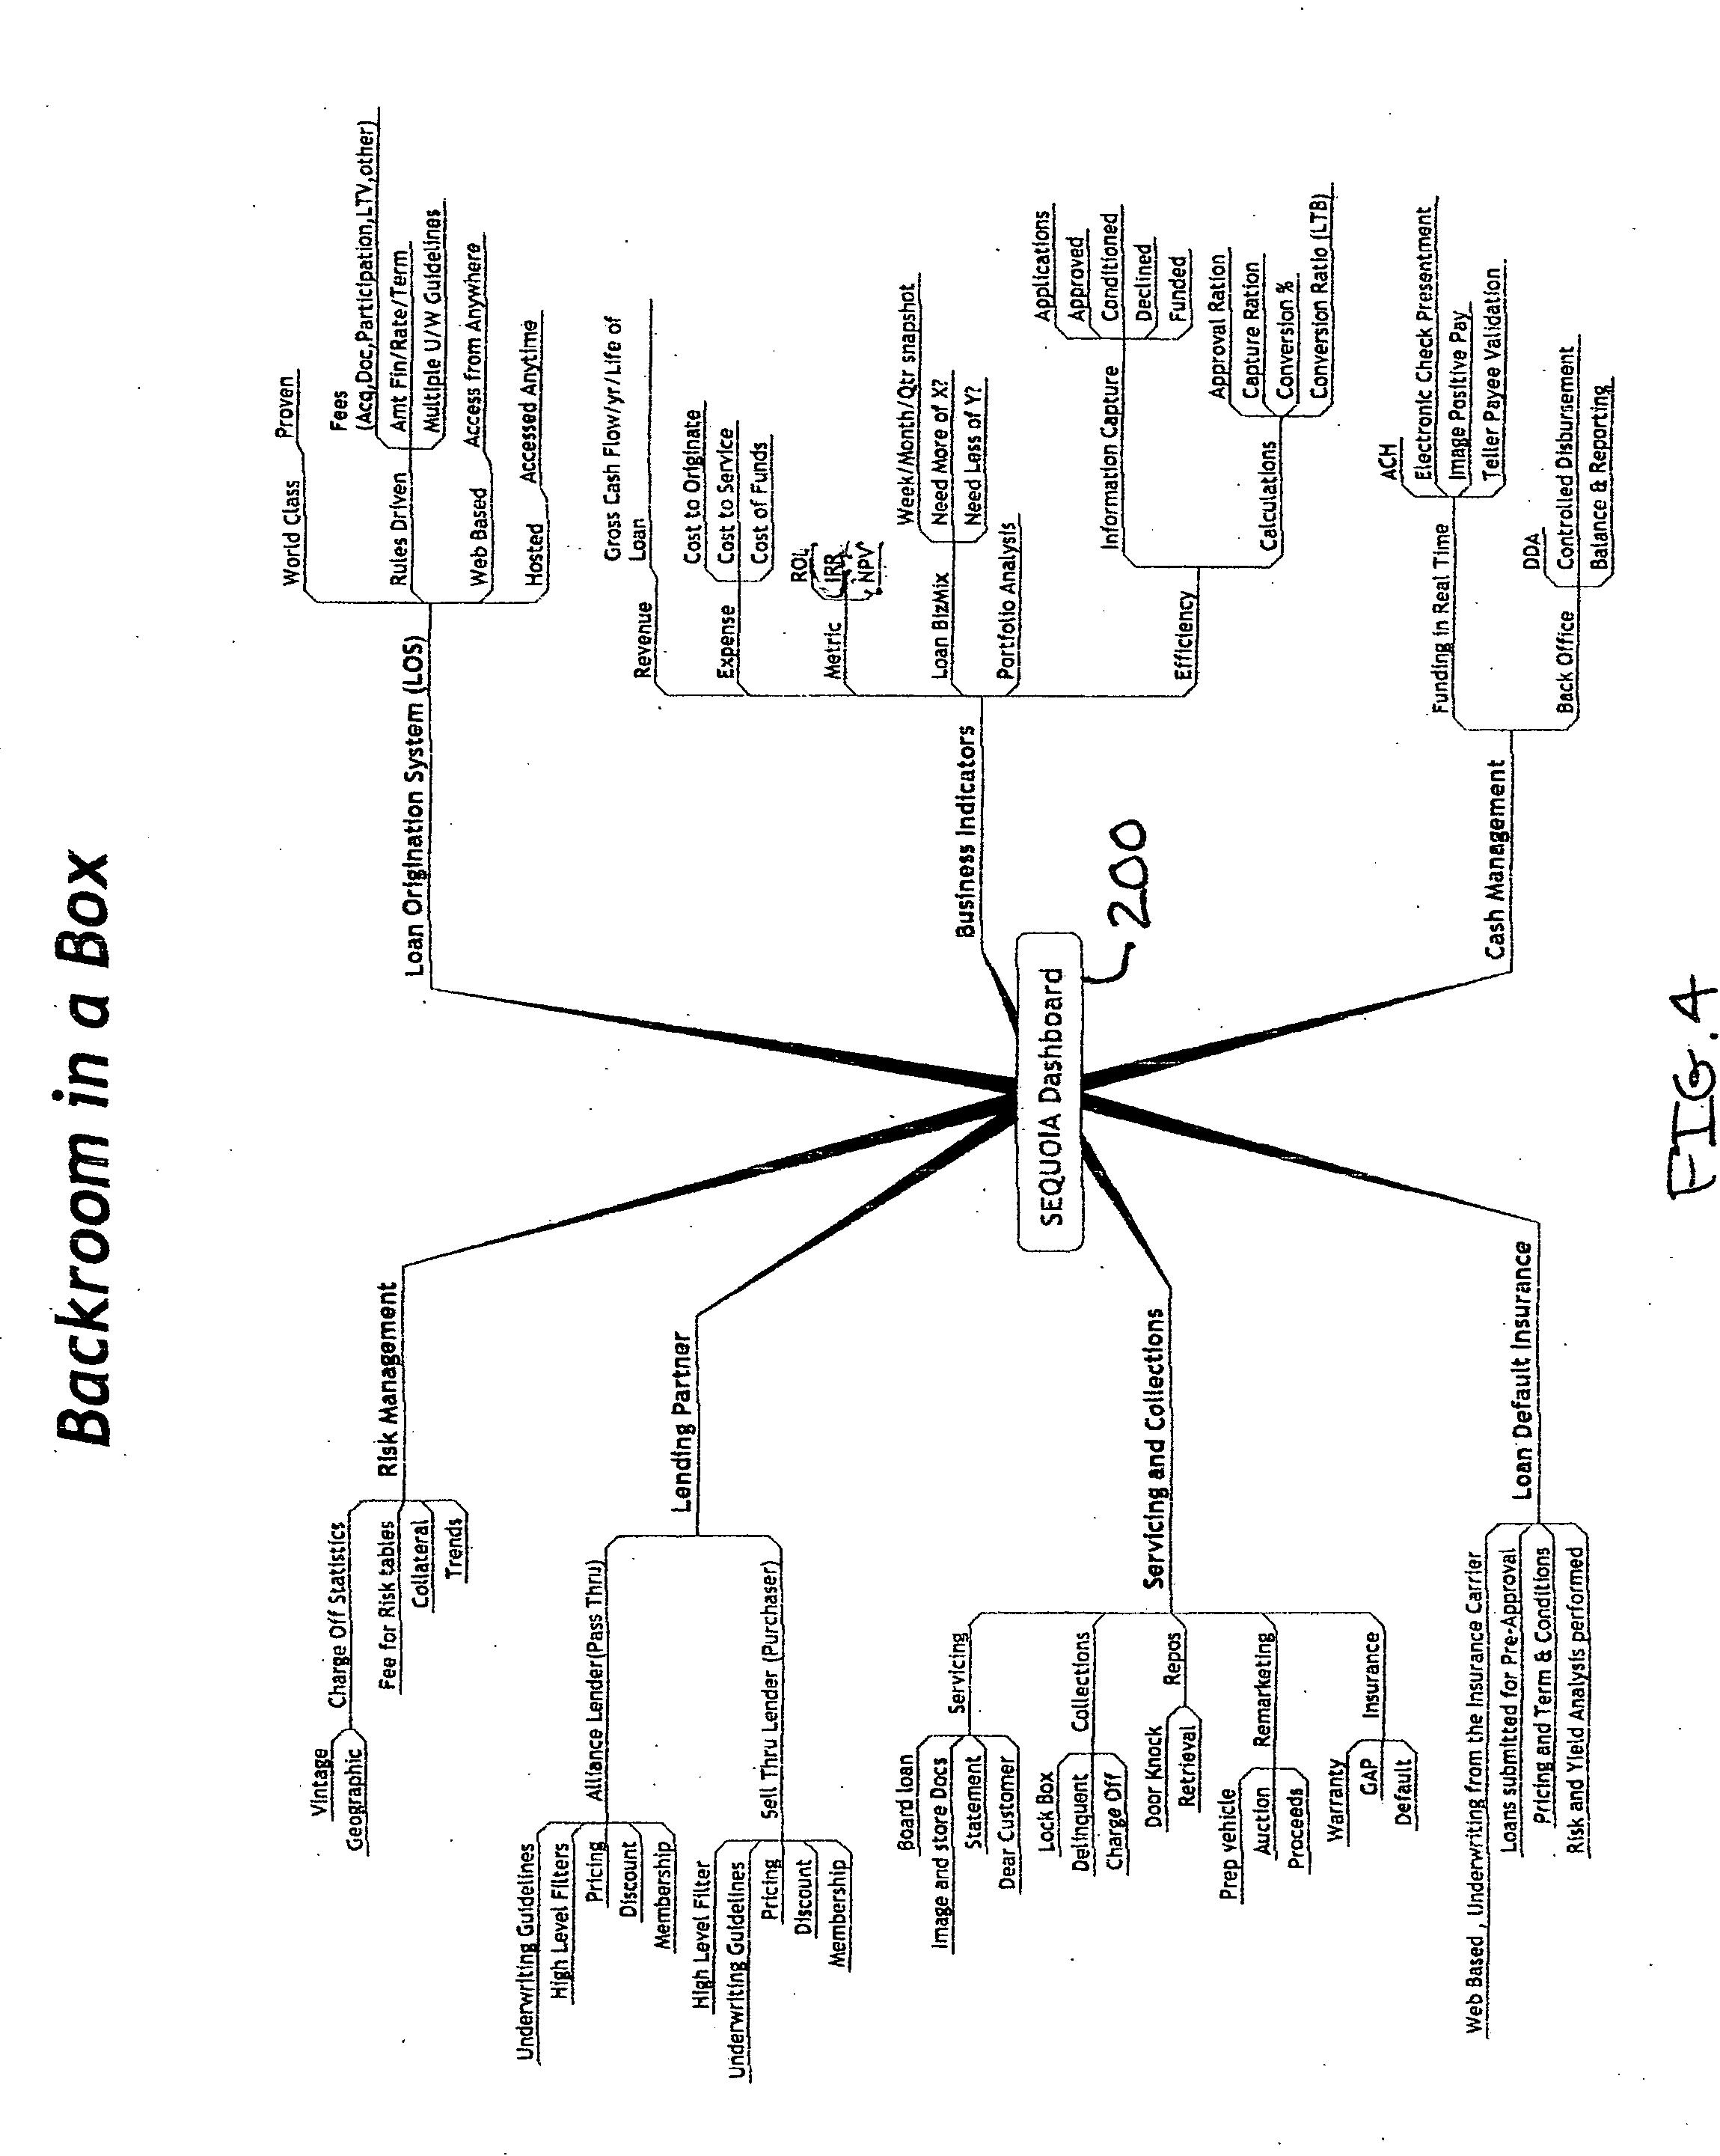 Patent US20050278249 - Business management system